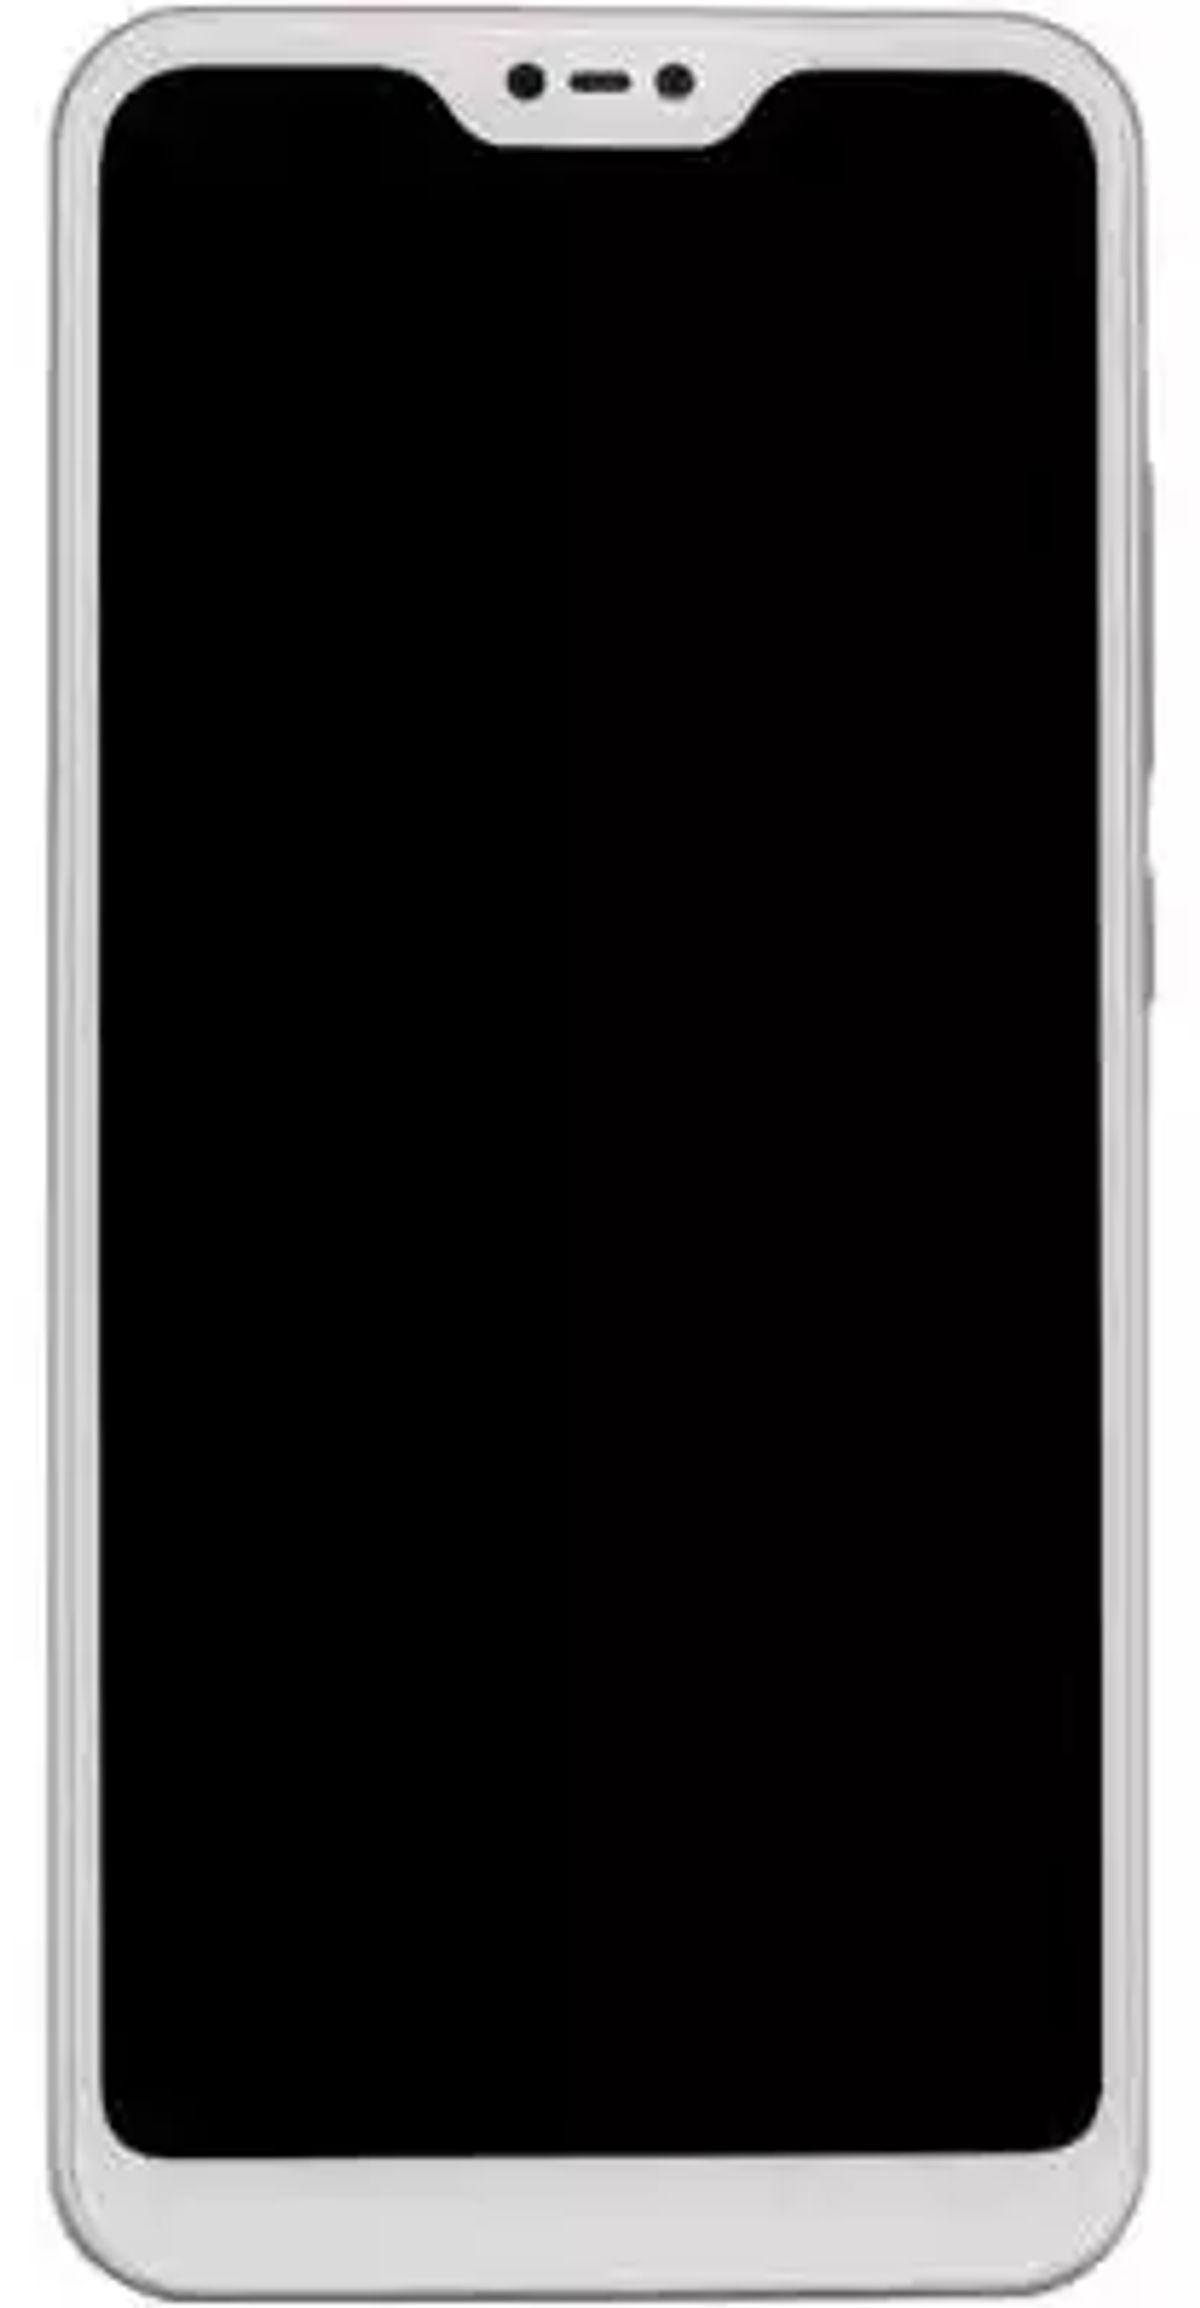 ज़ियौमी Redmi 6 Pro 128GB